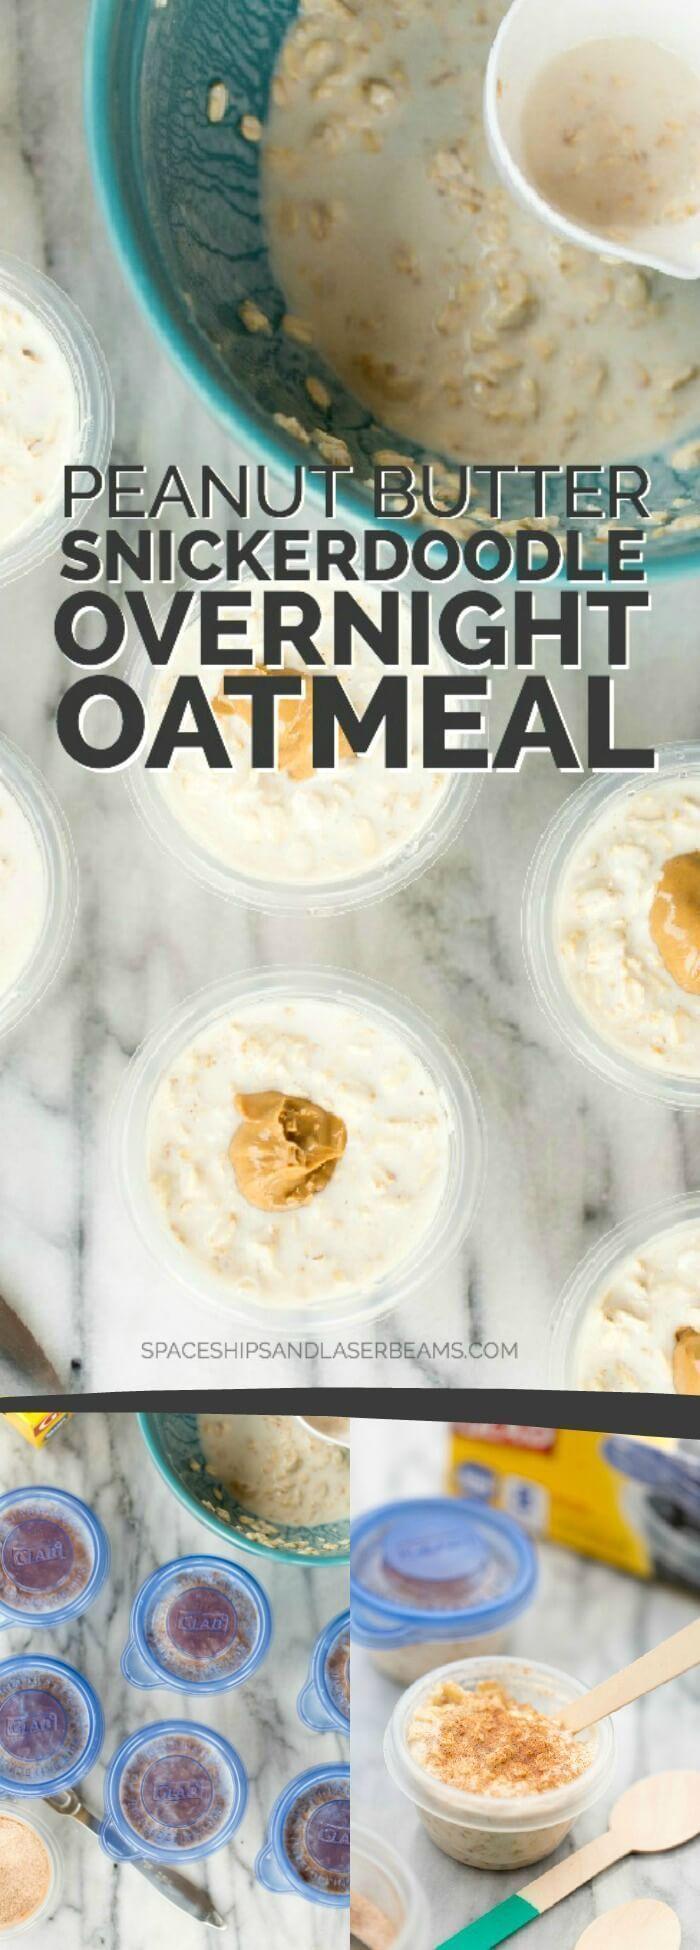 Peanut Butter Snickerdoodle Overnight Oatmeal | Breakfast Recipe